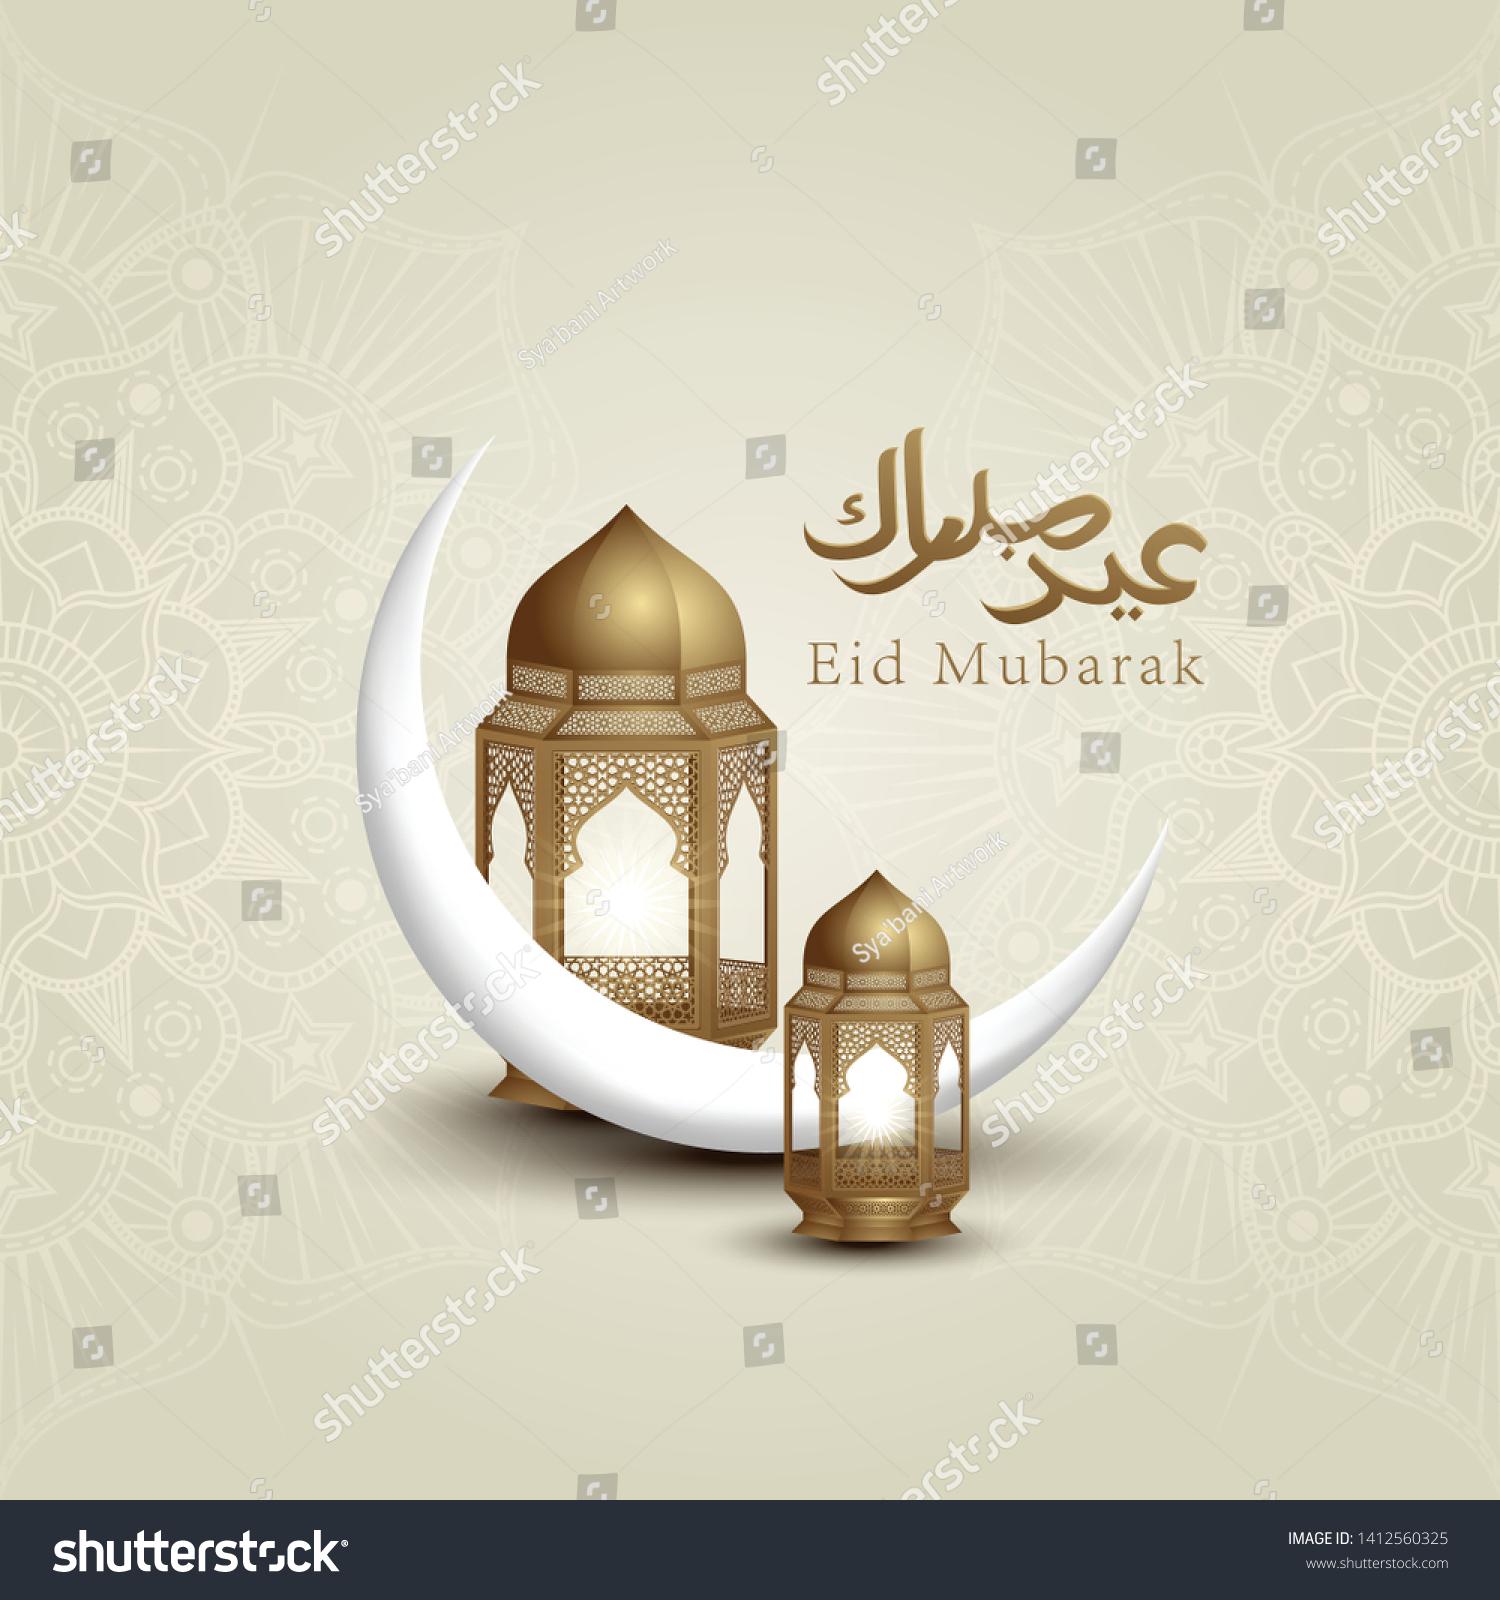 Eid Mubarak Islamic Calligraphy Golden Moon Stock Vector Royalty Free 1412560325